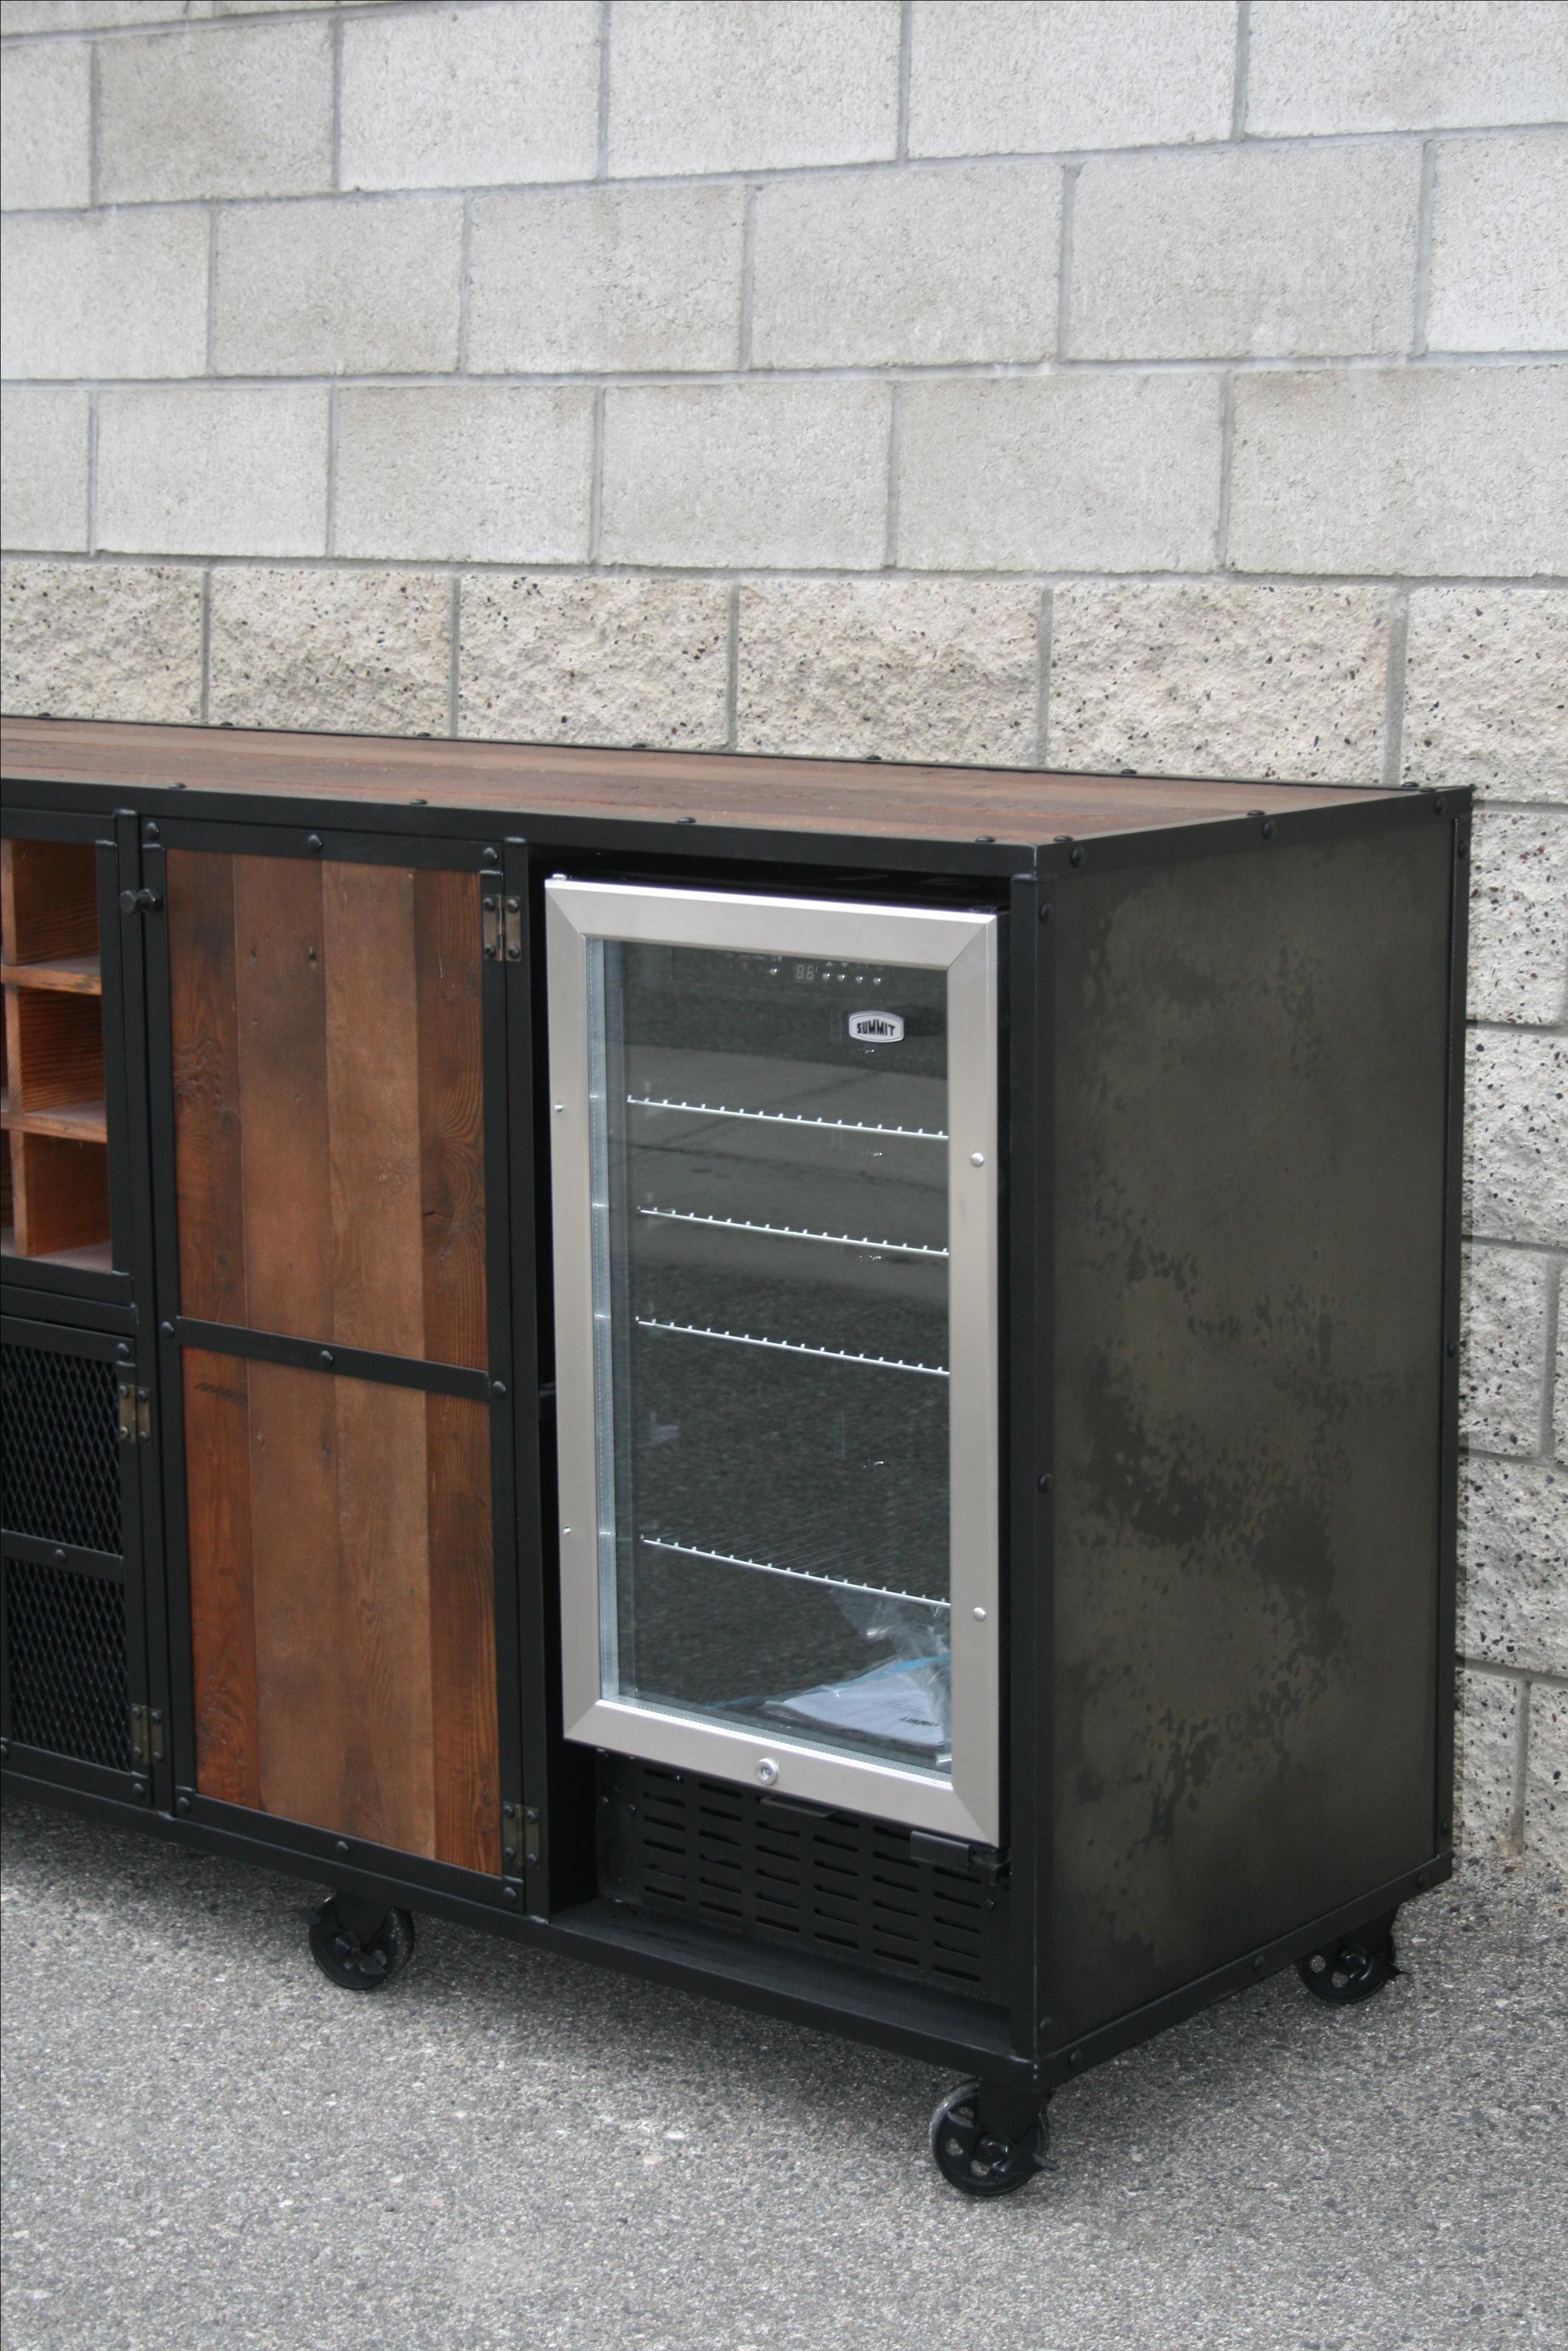 Buy a Handmade Beverage Center, Liquor Cabinet